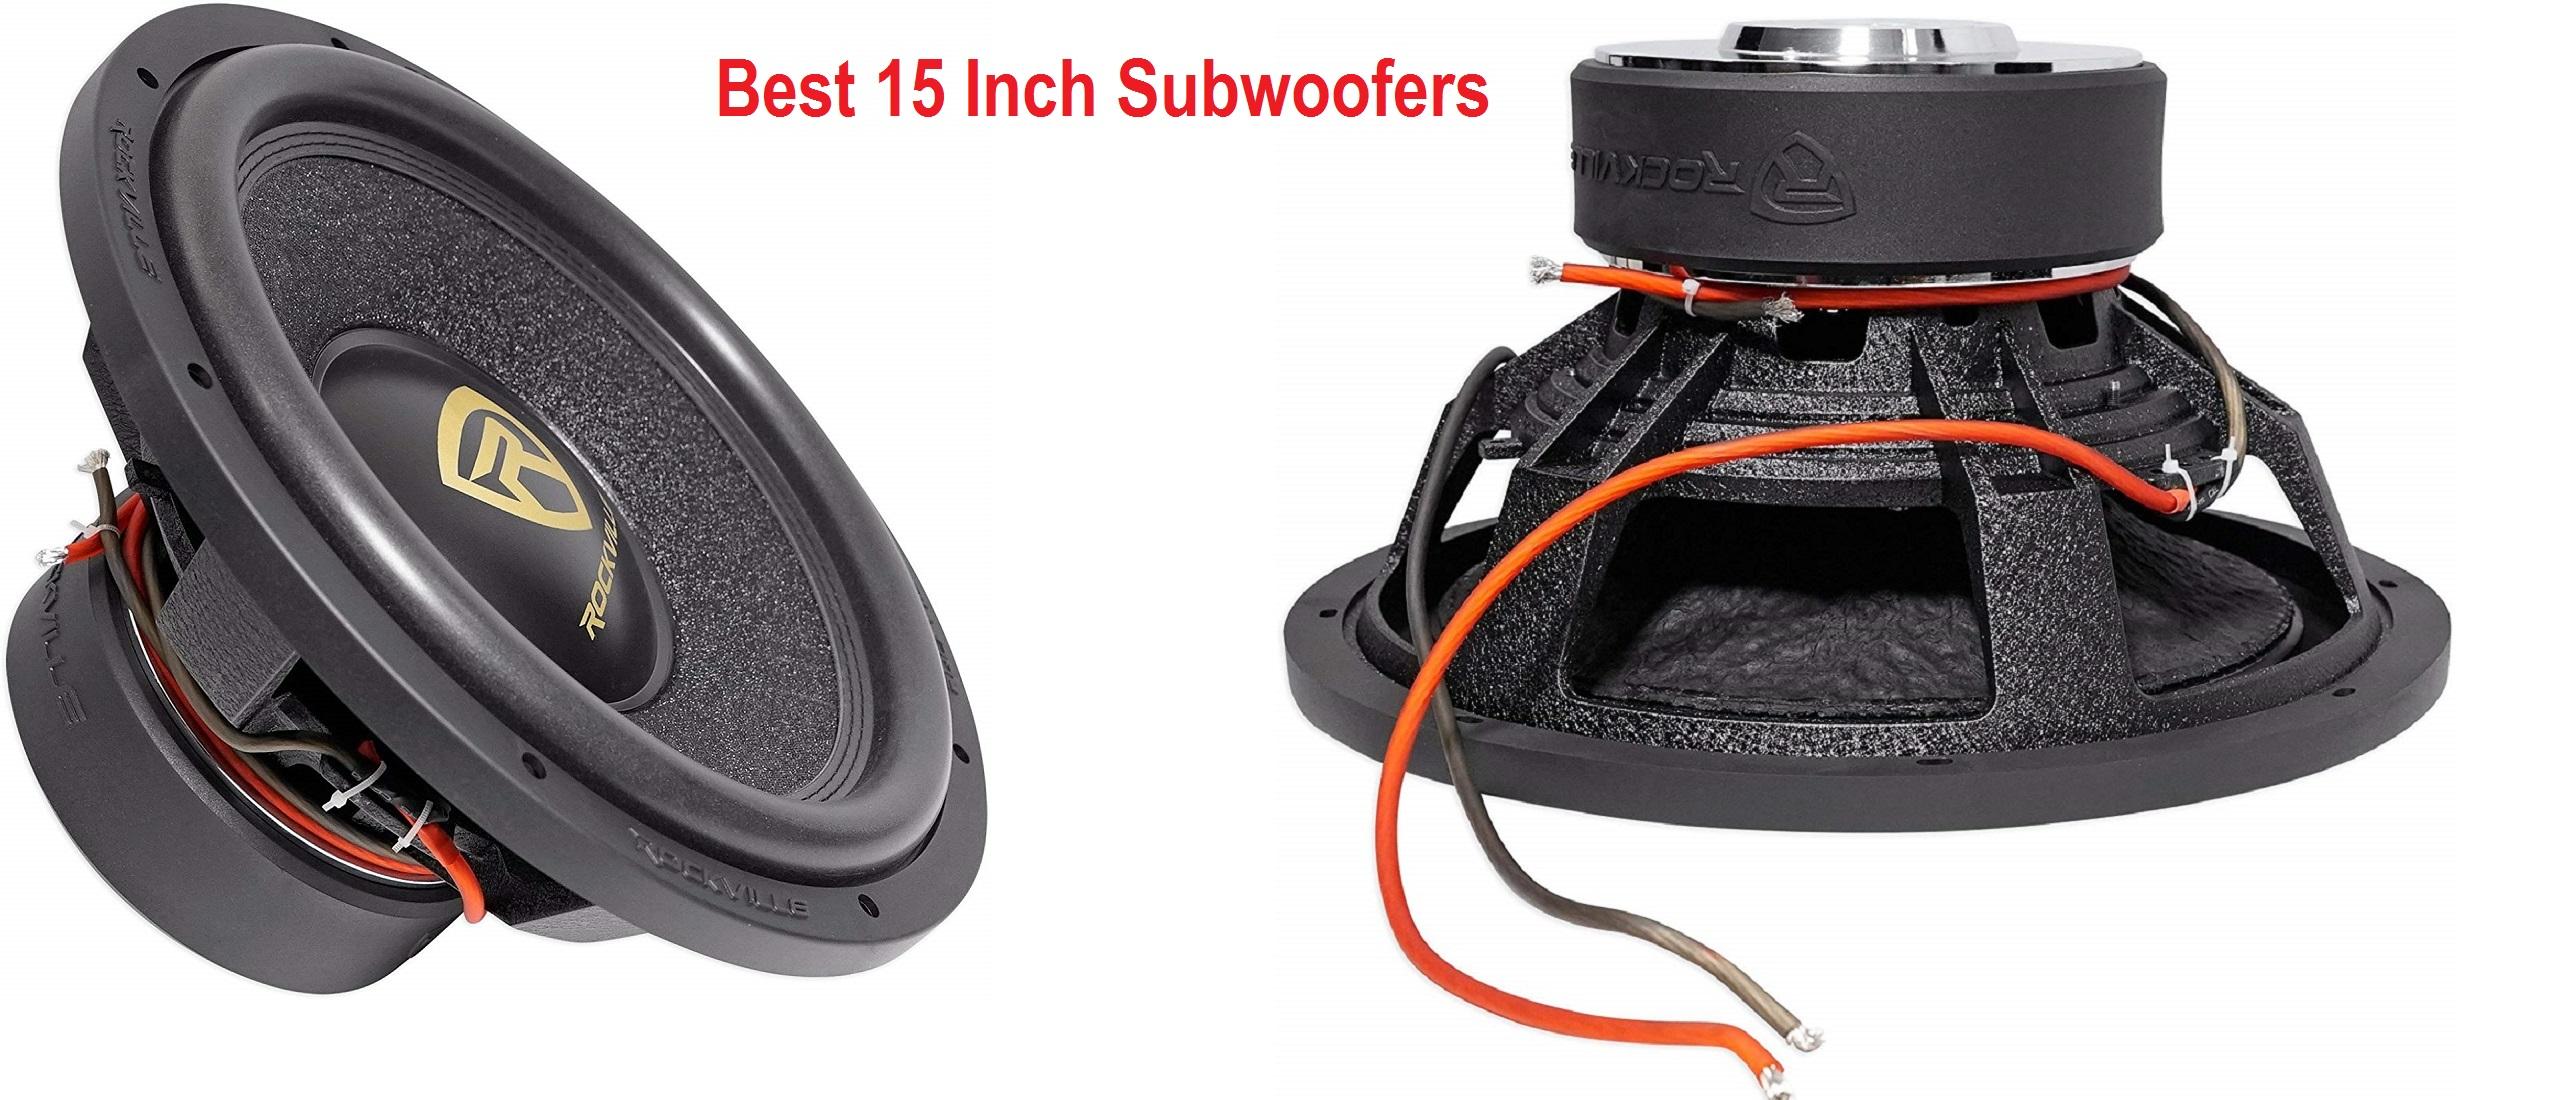 best 15 inch subwoofer